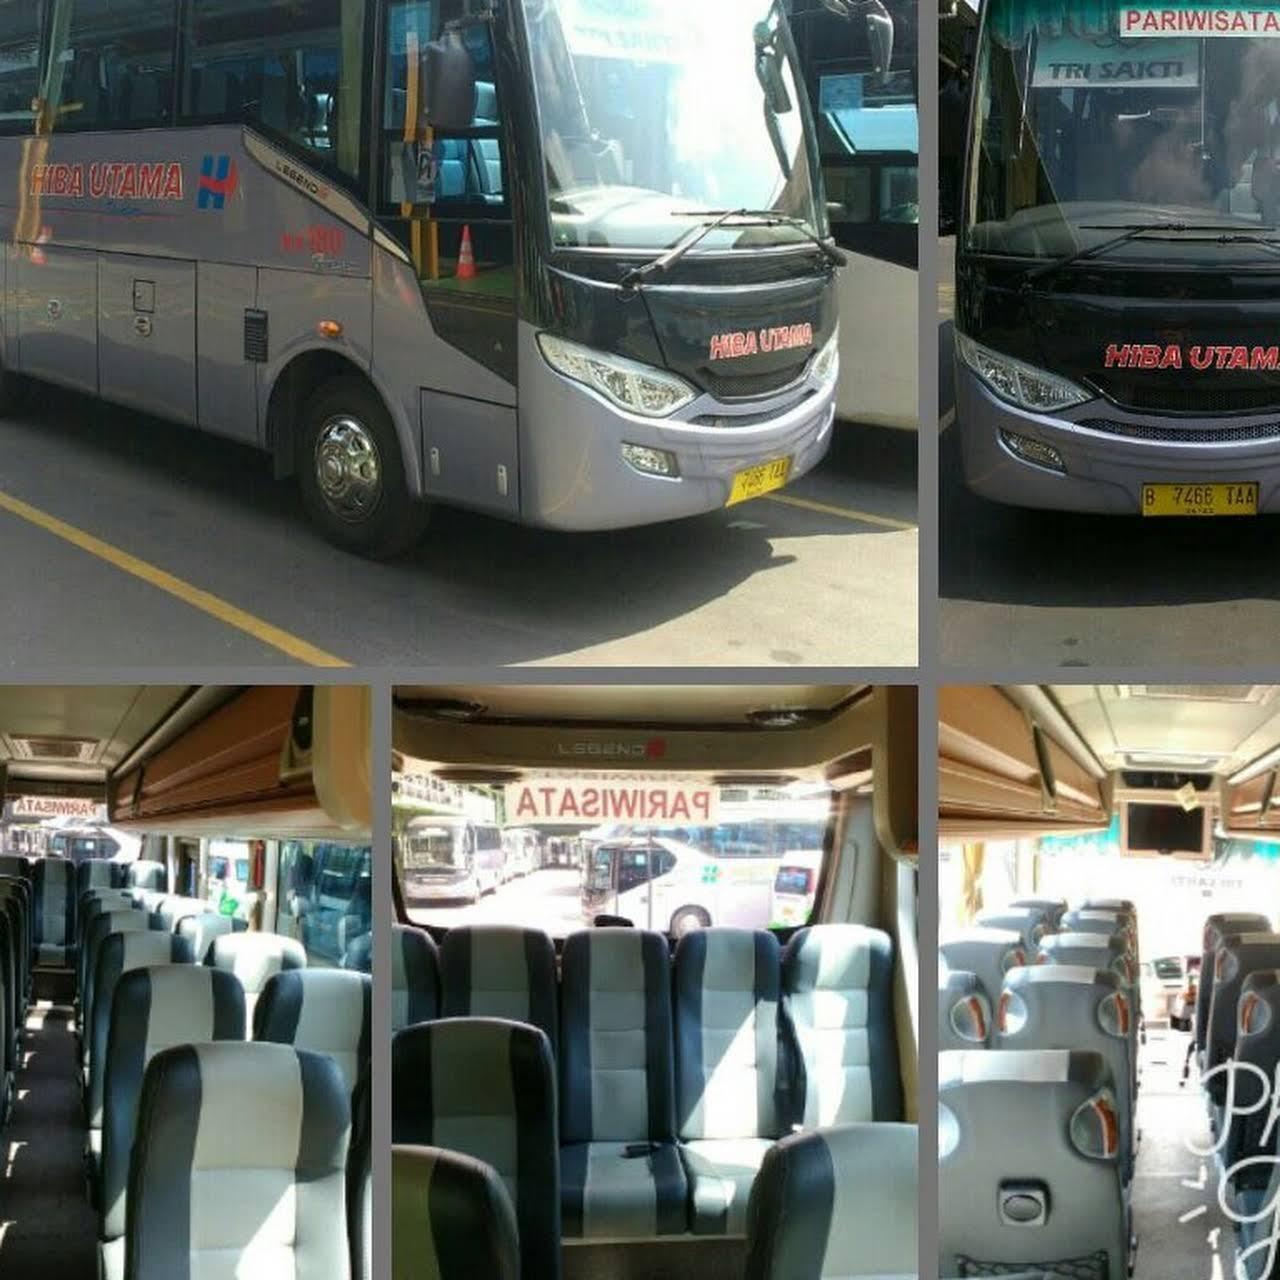 Bus Pariwisata Hiba Utama - Agen Cibinong